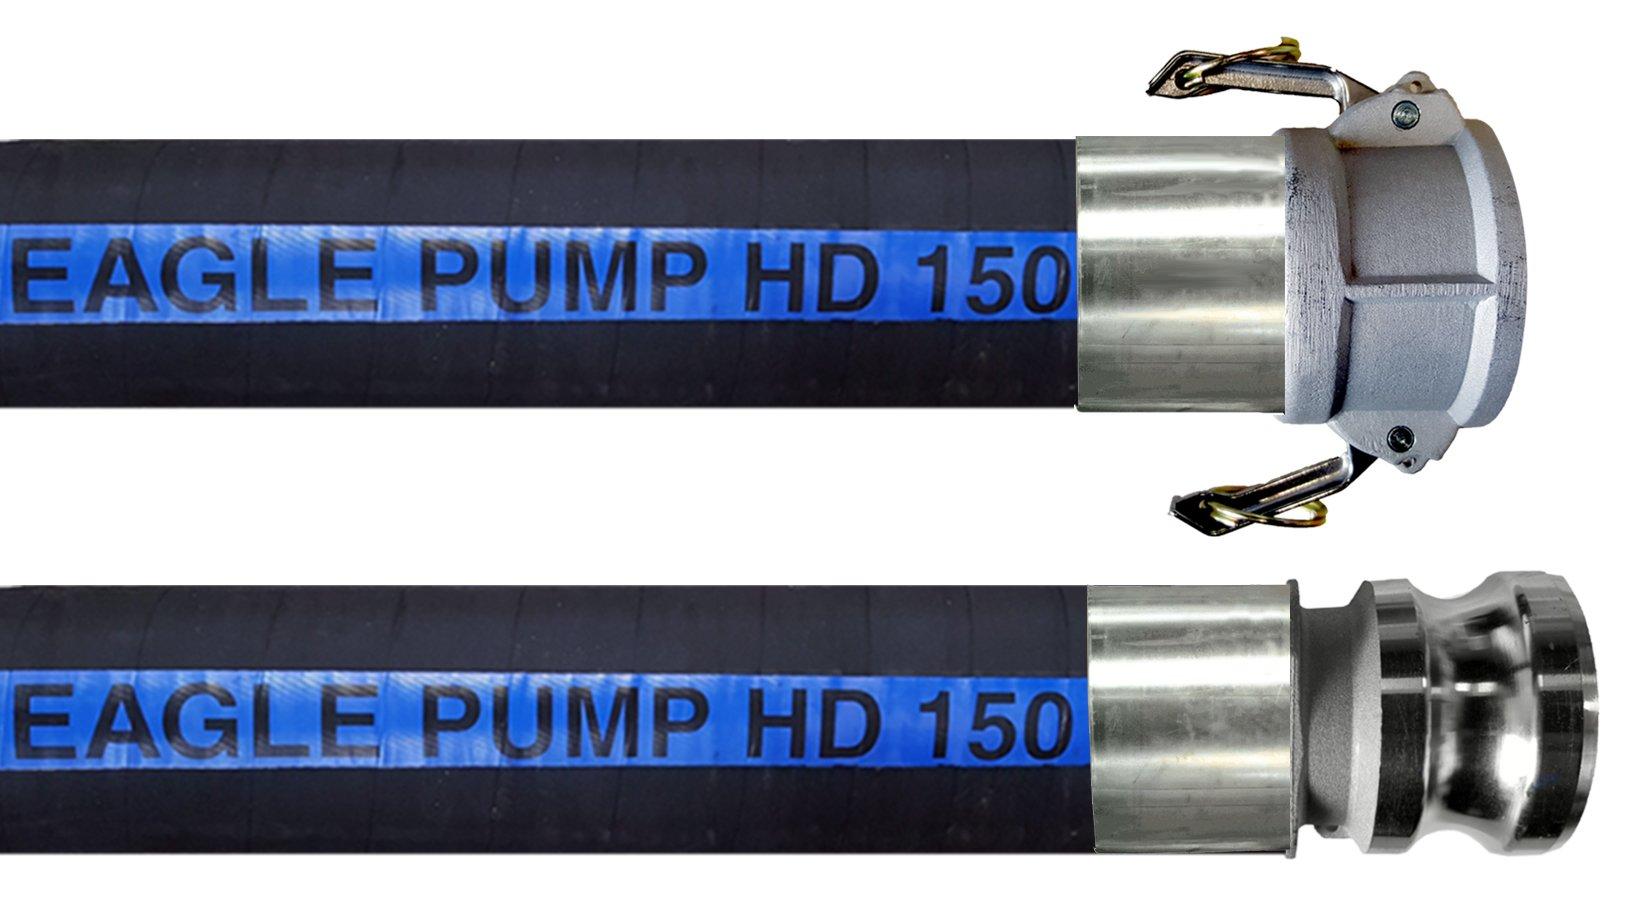 JGB Enterprises Eagle Hose Pump HD 150 Rubber Hose Assembly, Black, 2'' Male x Female Camlocks (CxE), 150 PSI Max Pressure, 2'' Hose ID, 20' Length by JGB Enterprises